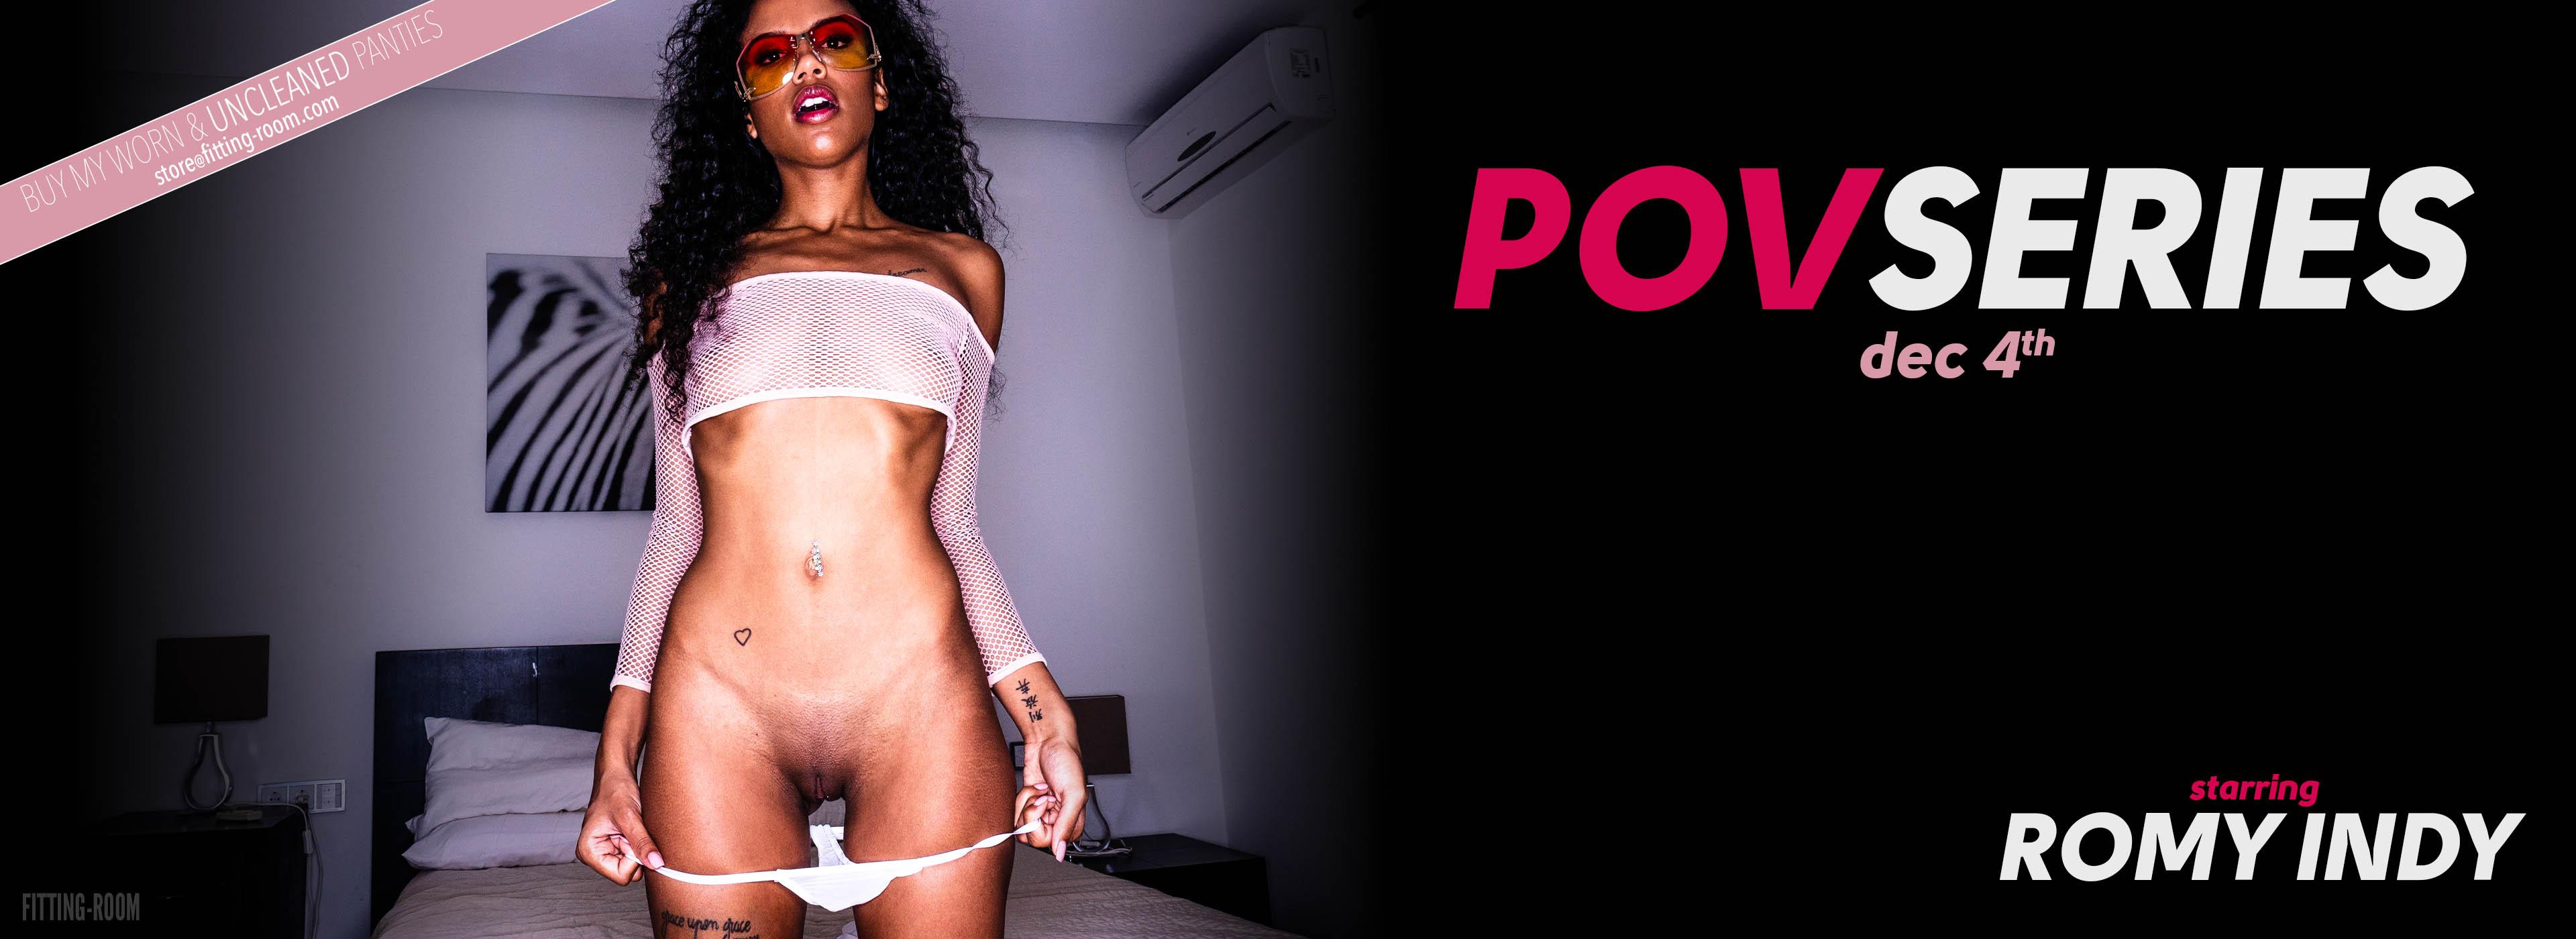 Romy Indy | Erotic Supermodel